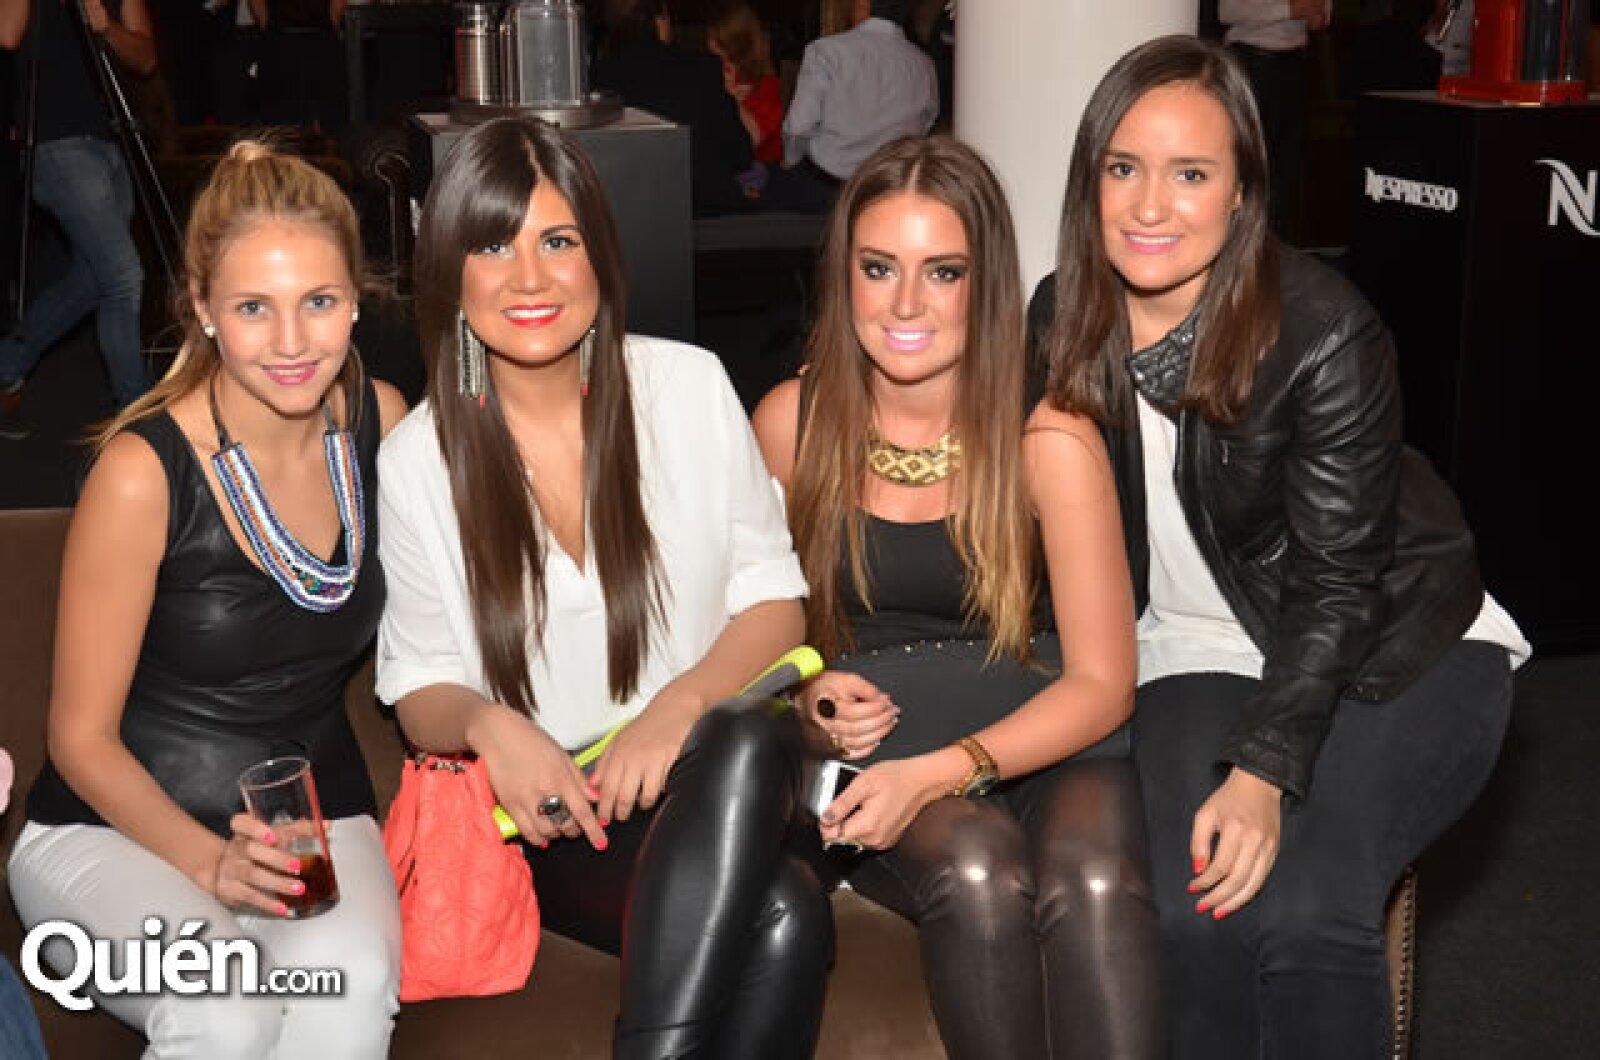 Nati Salame, Nicole Ruiz, Erica Arellano y Solange Turón